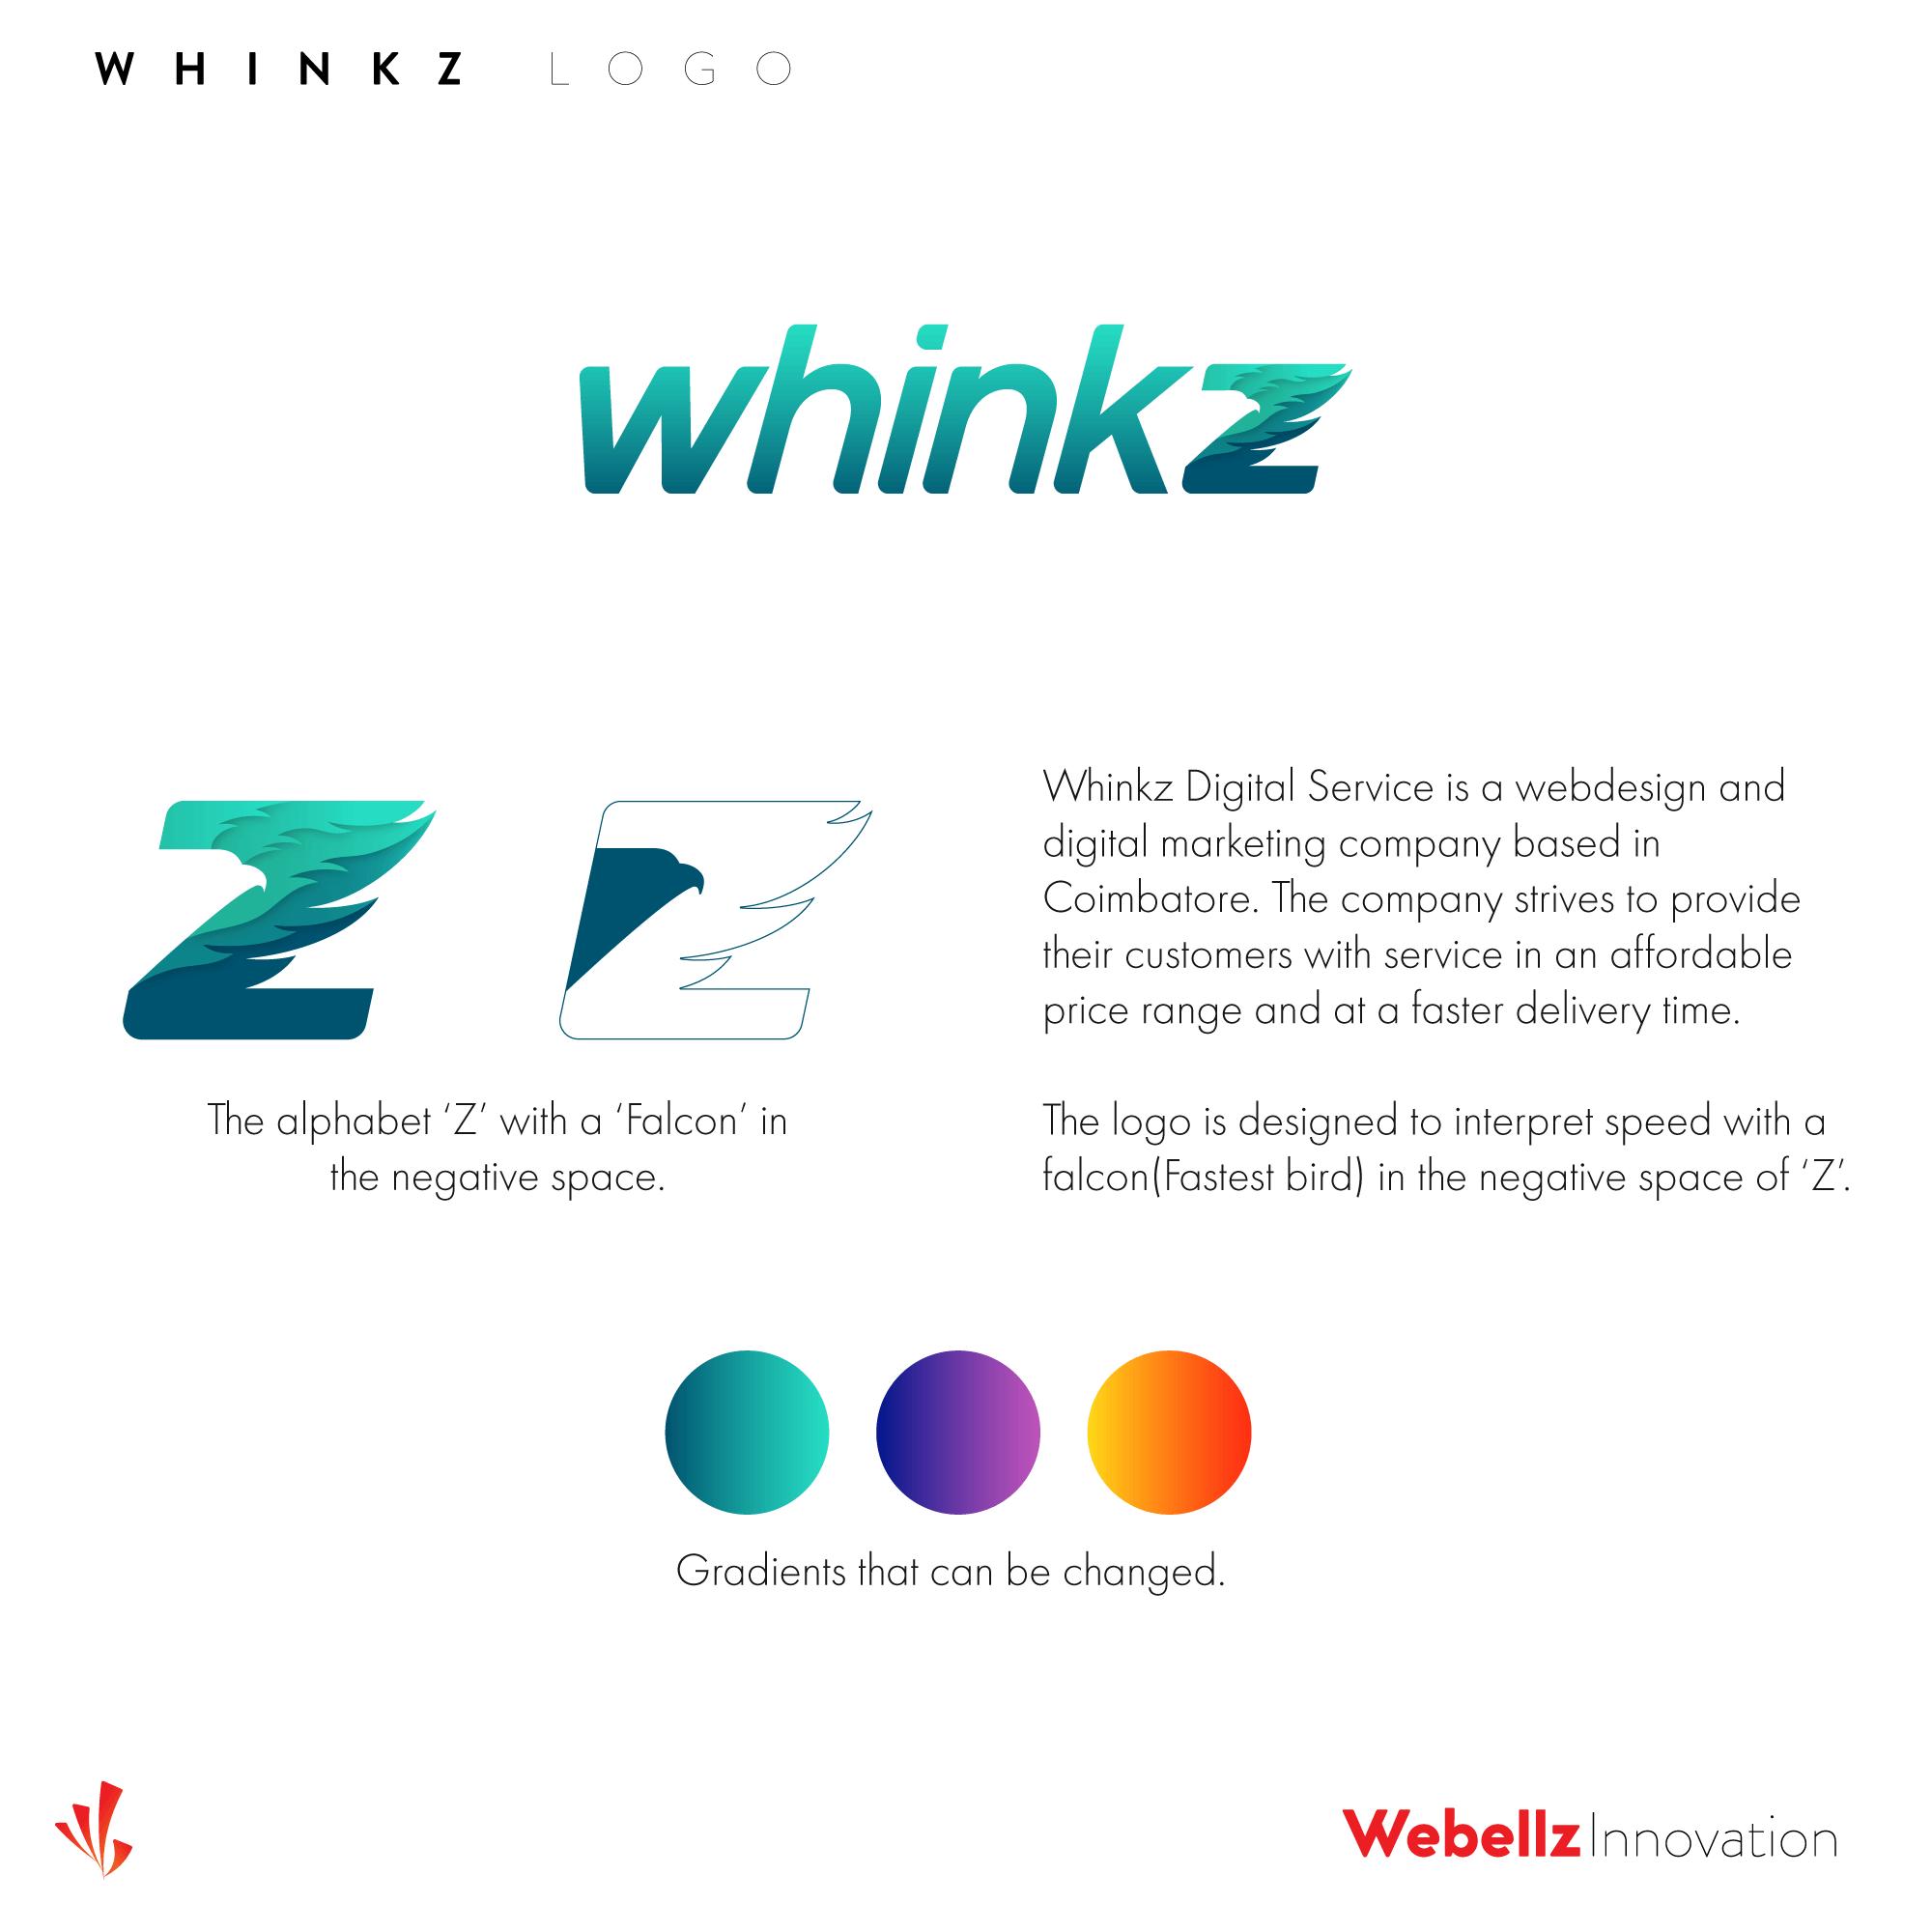 Whinkz forSM 004 | Logo designer in Coimbatore